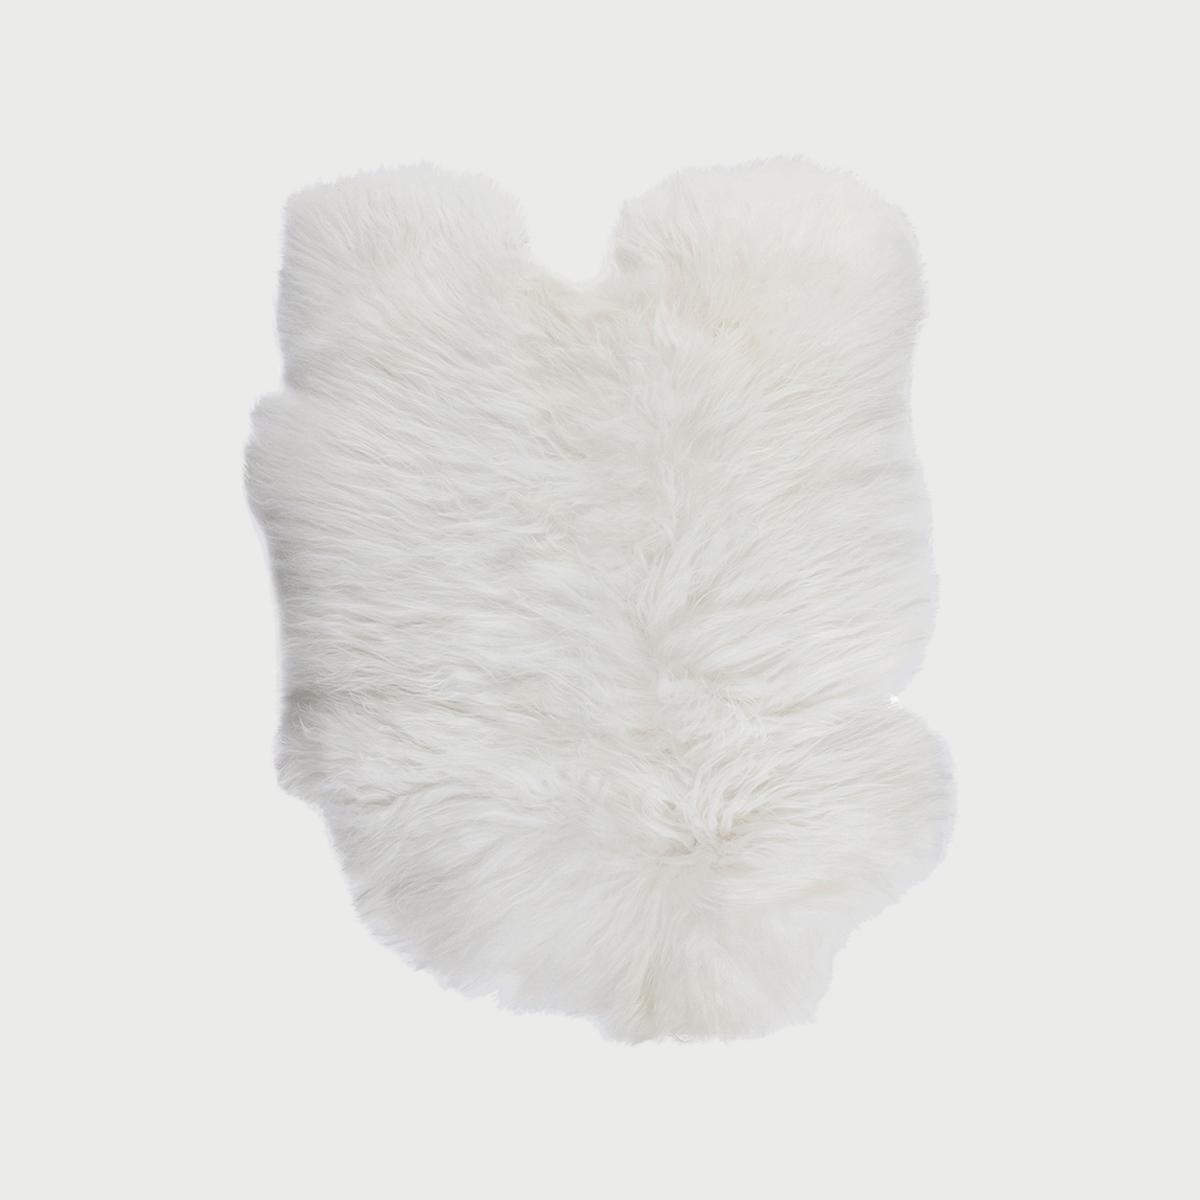 Sheepskin whiteweb 2048x2048